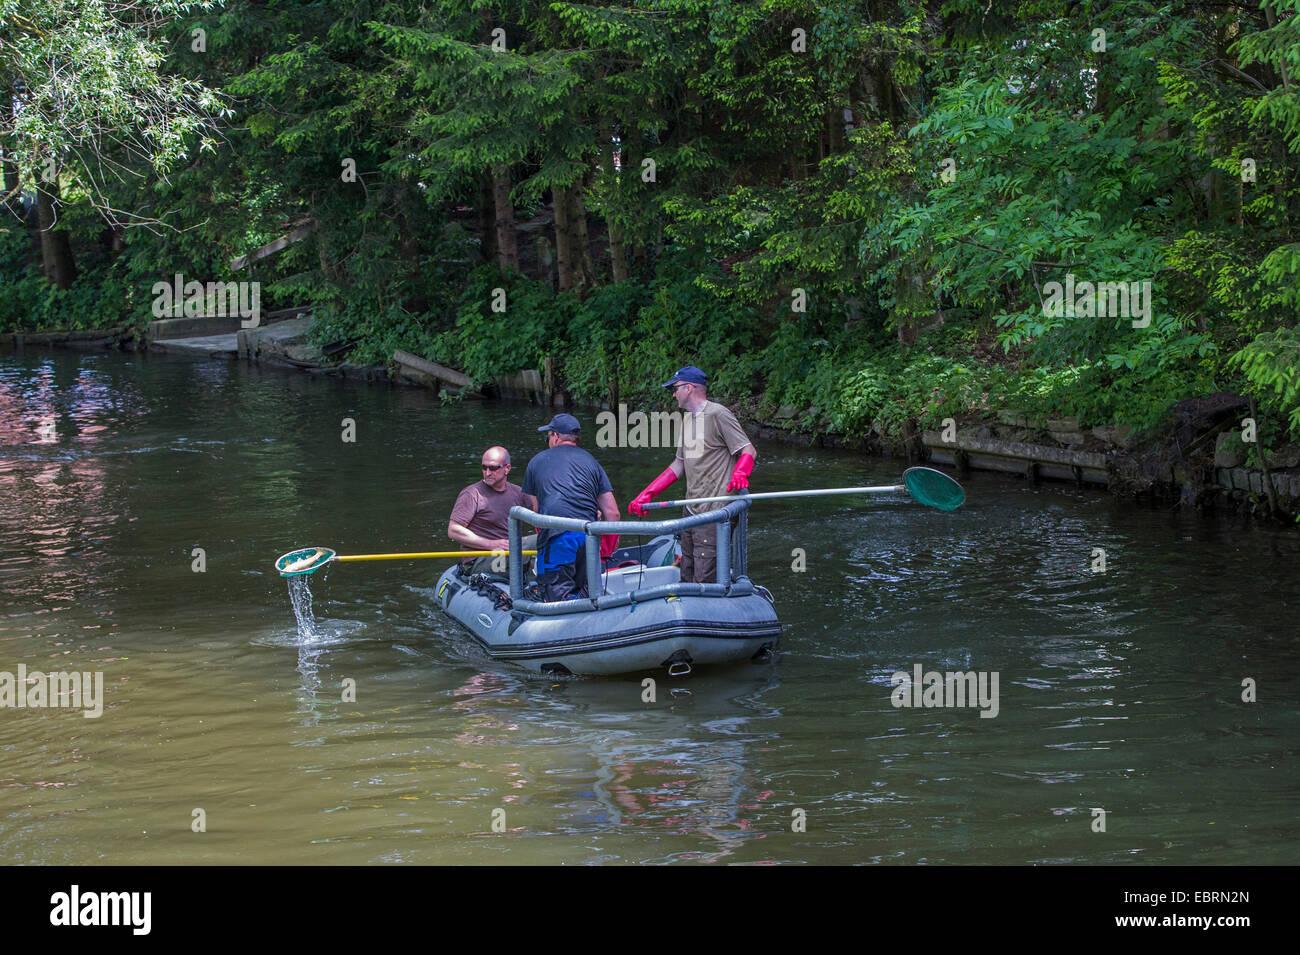 electrofishing, stock control for EU Water Framework Directive, Germany, Bavaria, Fluss Dorfen - Stock Image